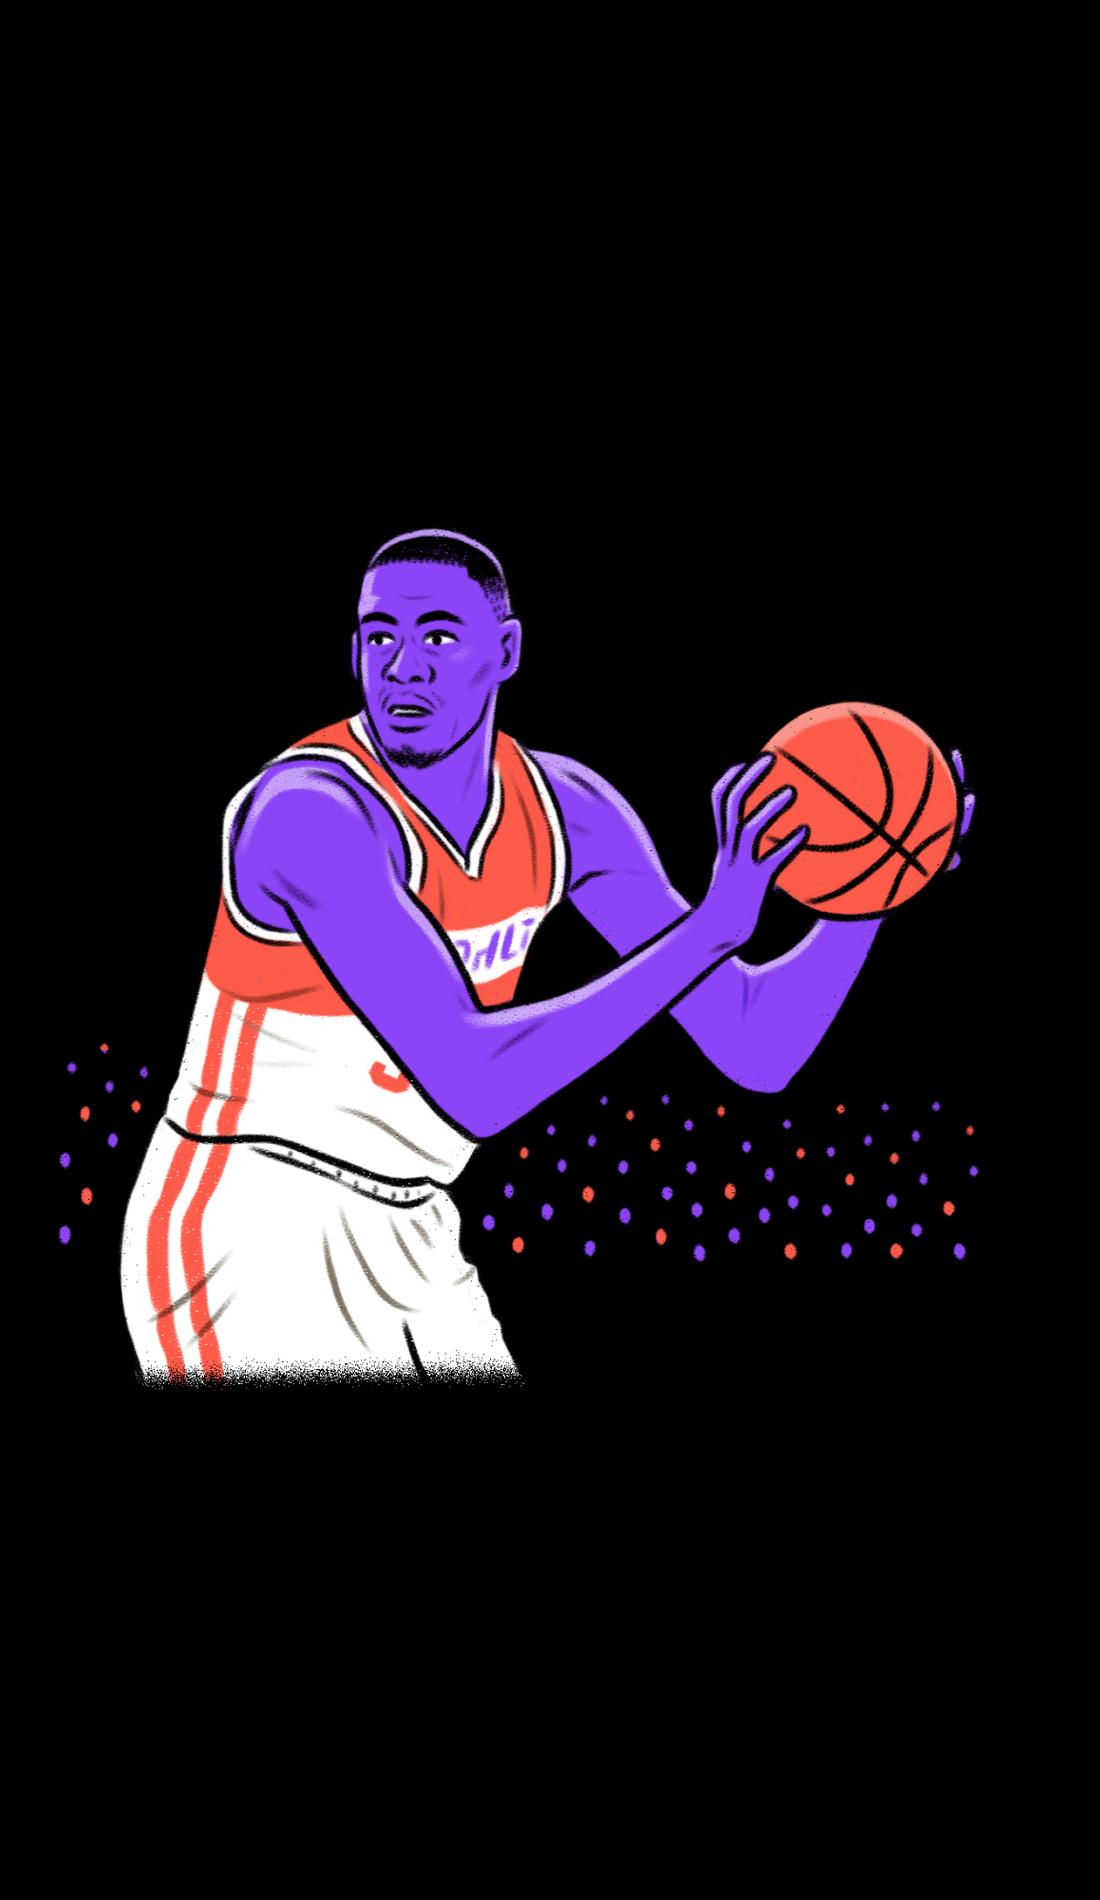 A Northeastern Huskies Basketball live event